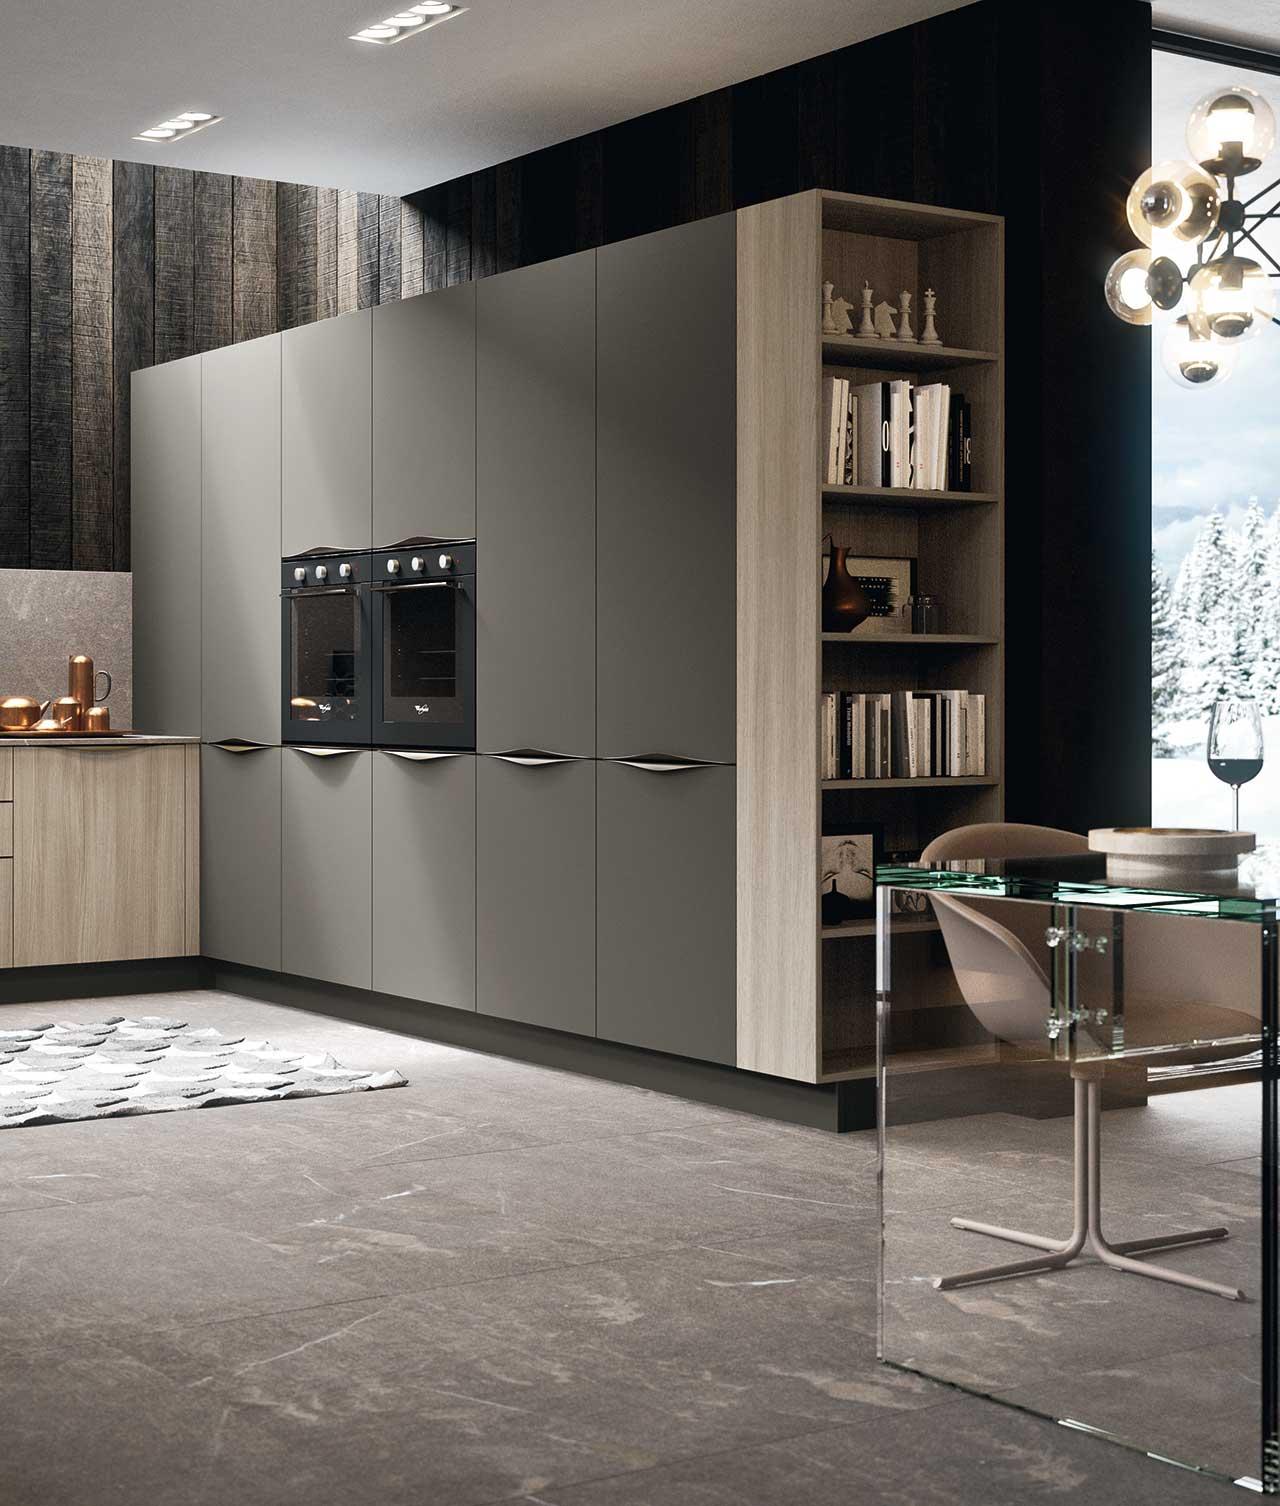 cucina_linear_10_antares_ composizione 4_ colonne cucina